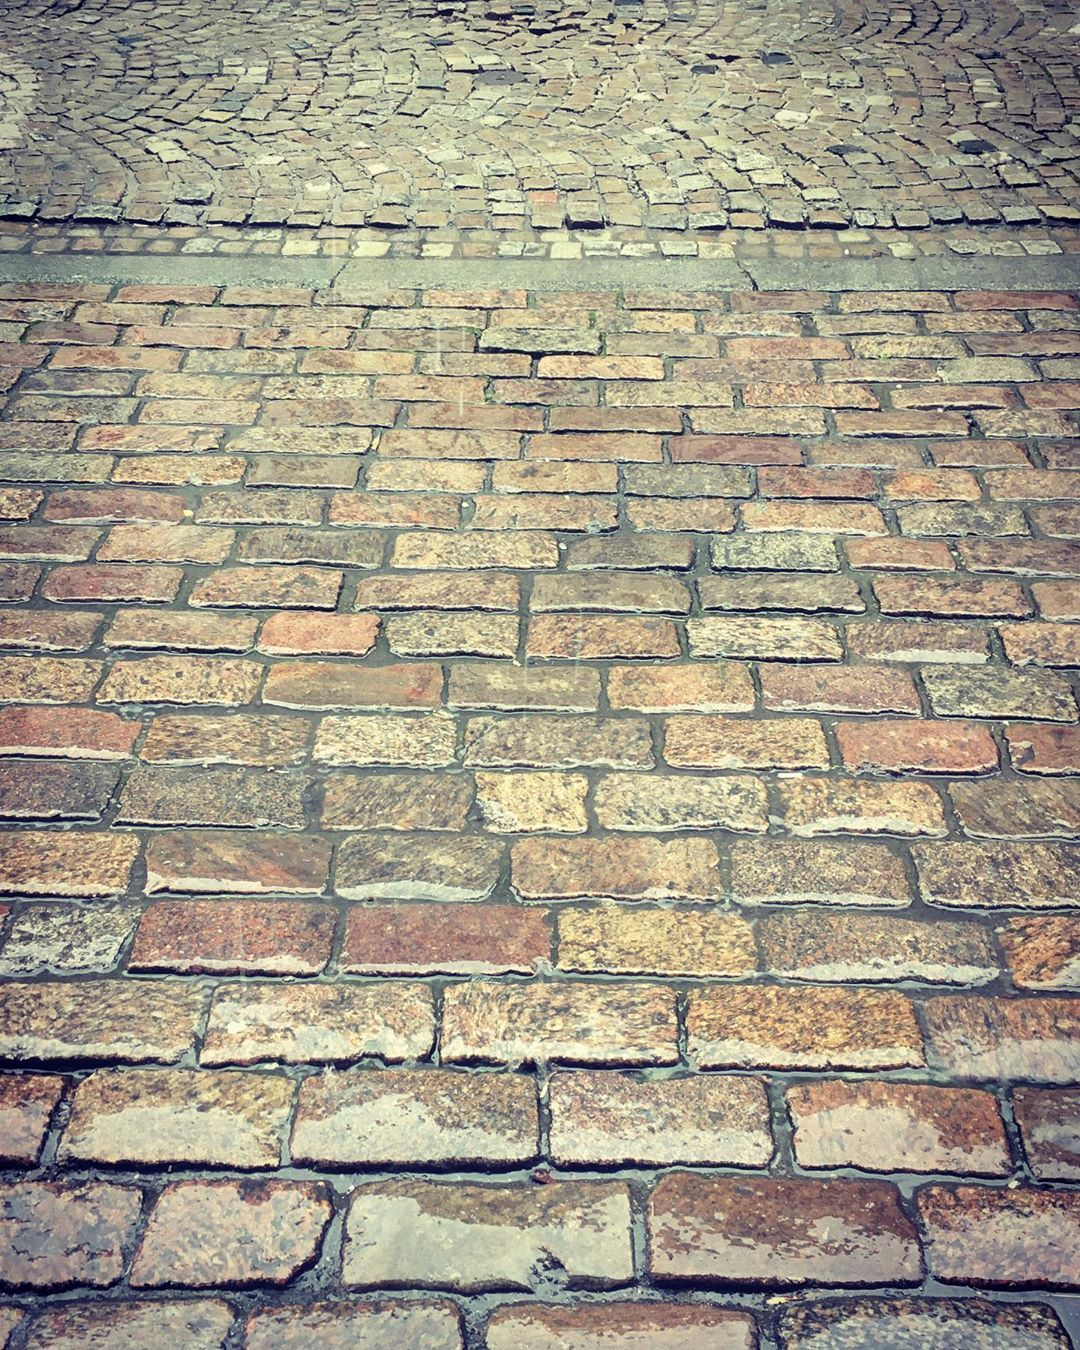 #rain #street #cobblestone #padadeszcz #mojemiasto #warsaw #urbanjungle #citylife #details #moments